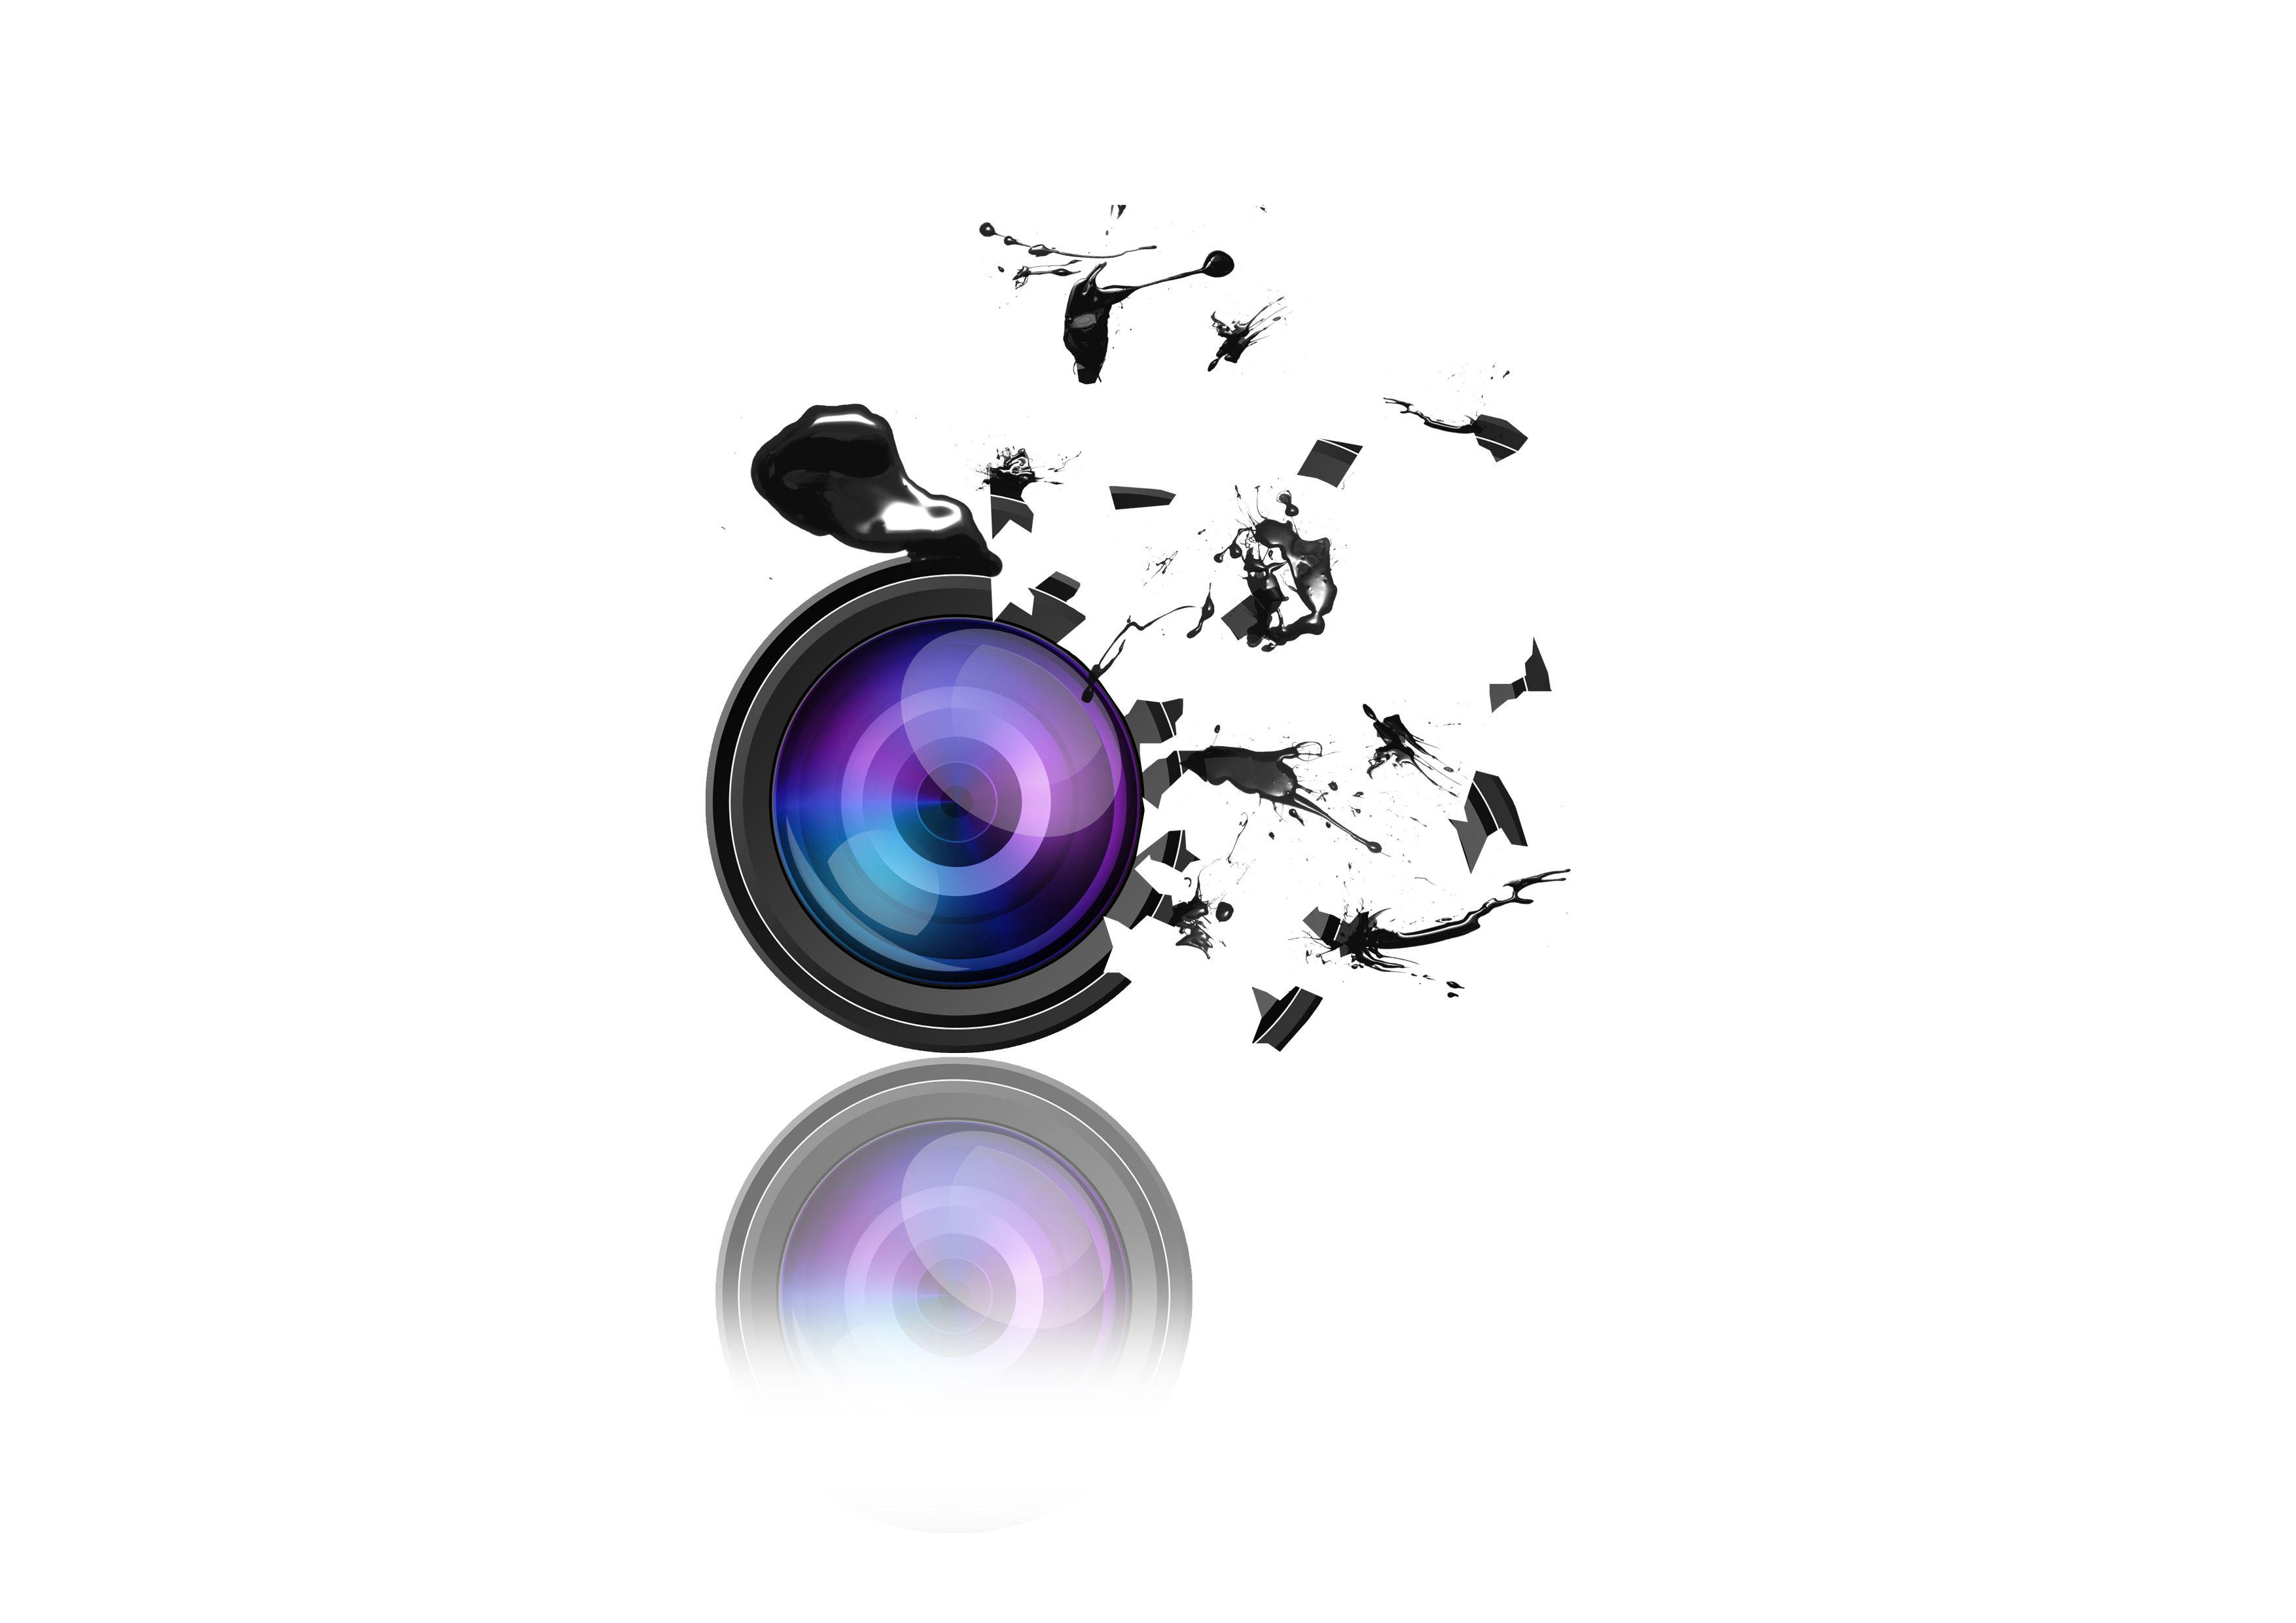 Pin By Sanjeewan Sanju On My Saves Camera Logos Design Camera Logo Photography Logo Hd